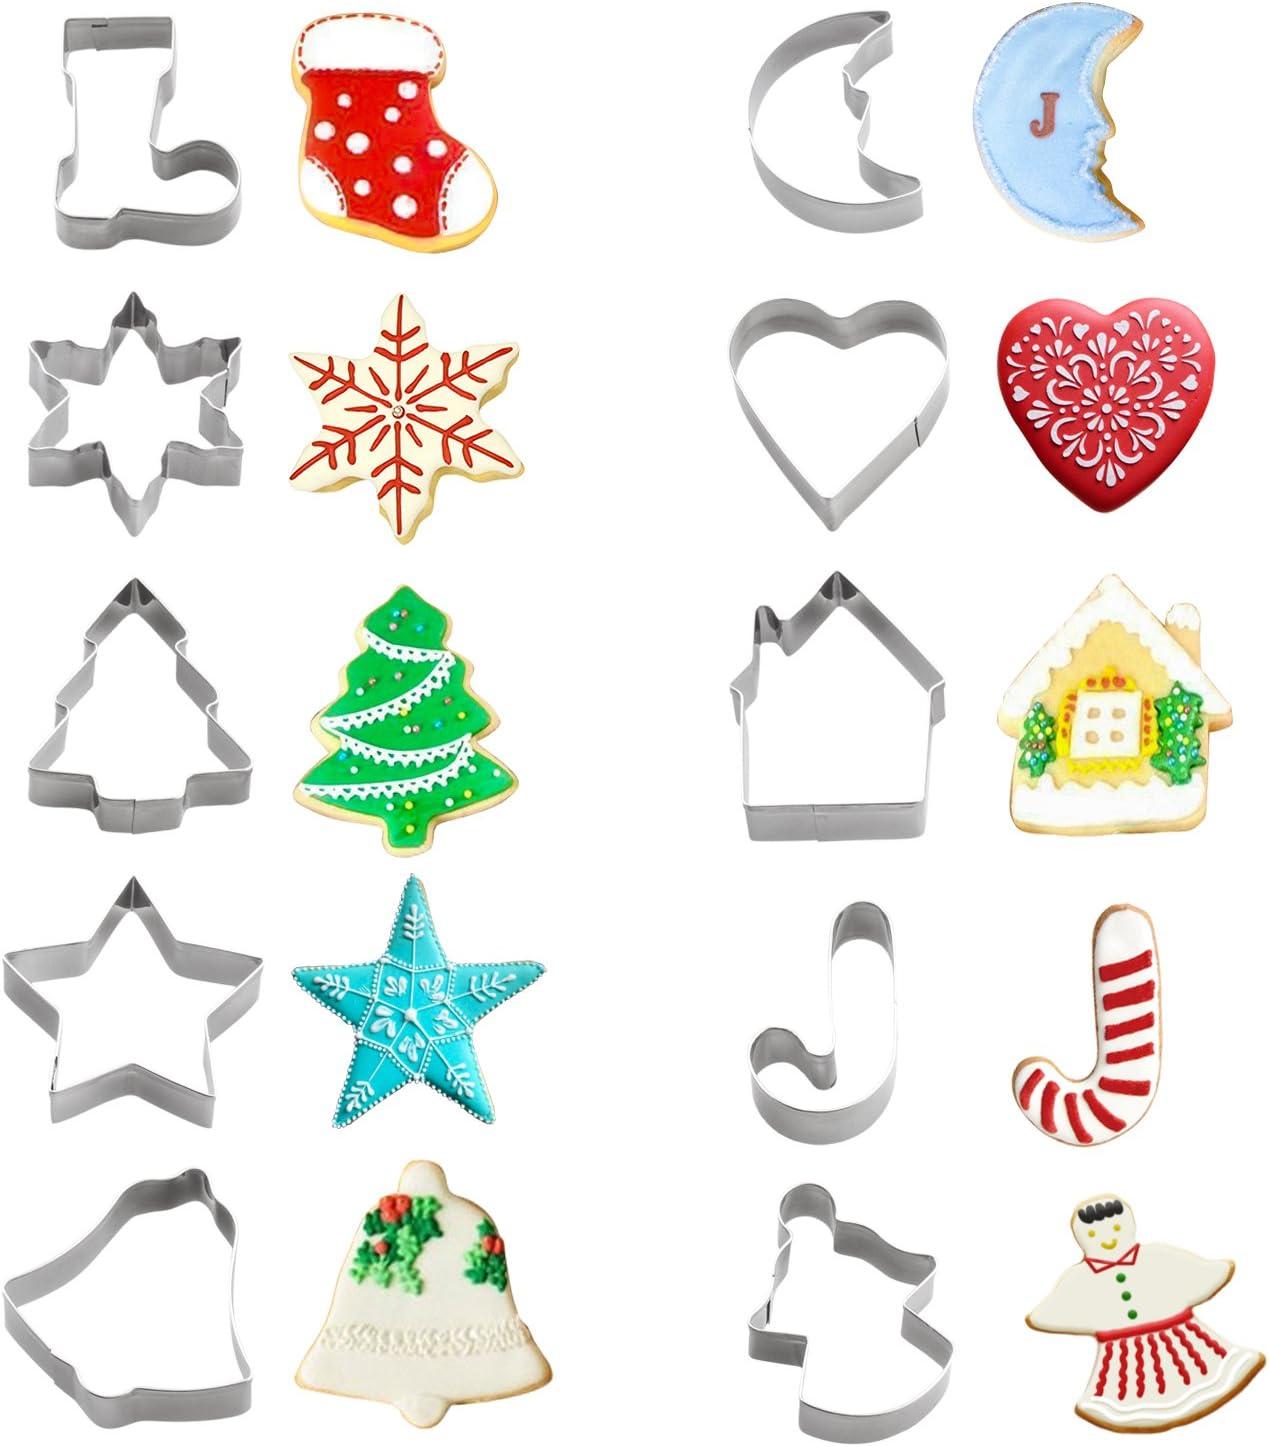 Cookie Cutter Molds Earrings Cookies Christmas Tree Heart Baking